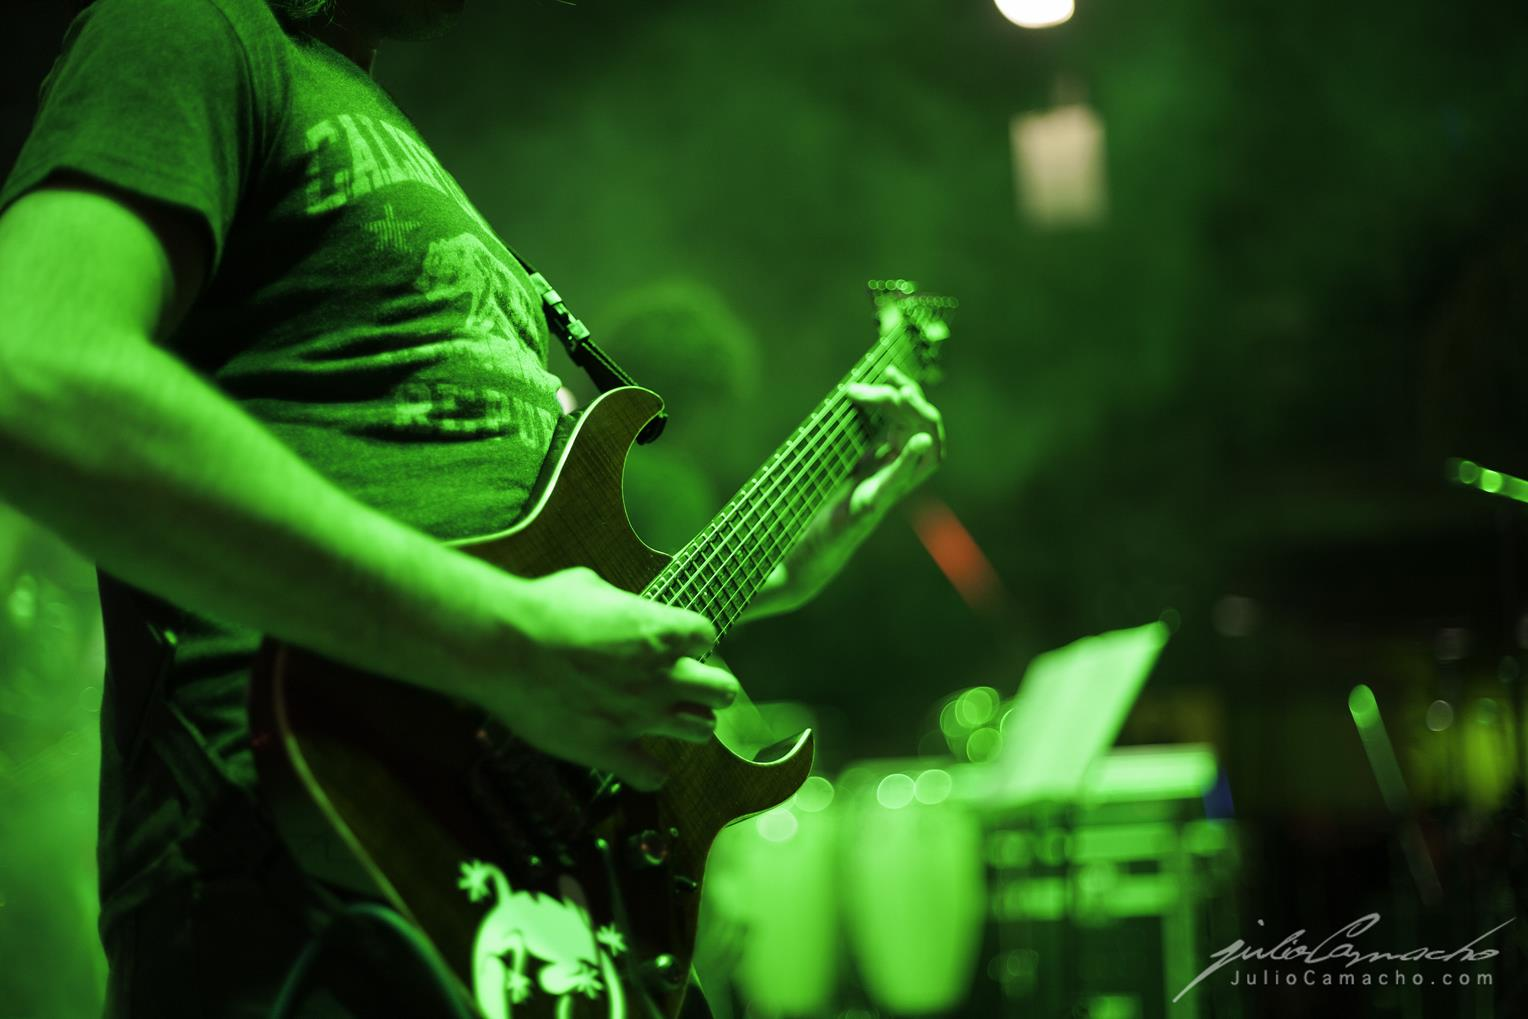 2014-10-30 31 CAST TOUR Ensenada y Tijuana - 1523 - www.Juli (Copy).jpg